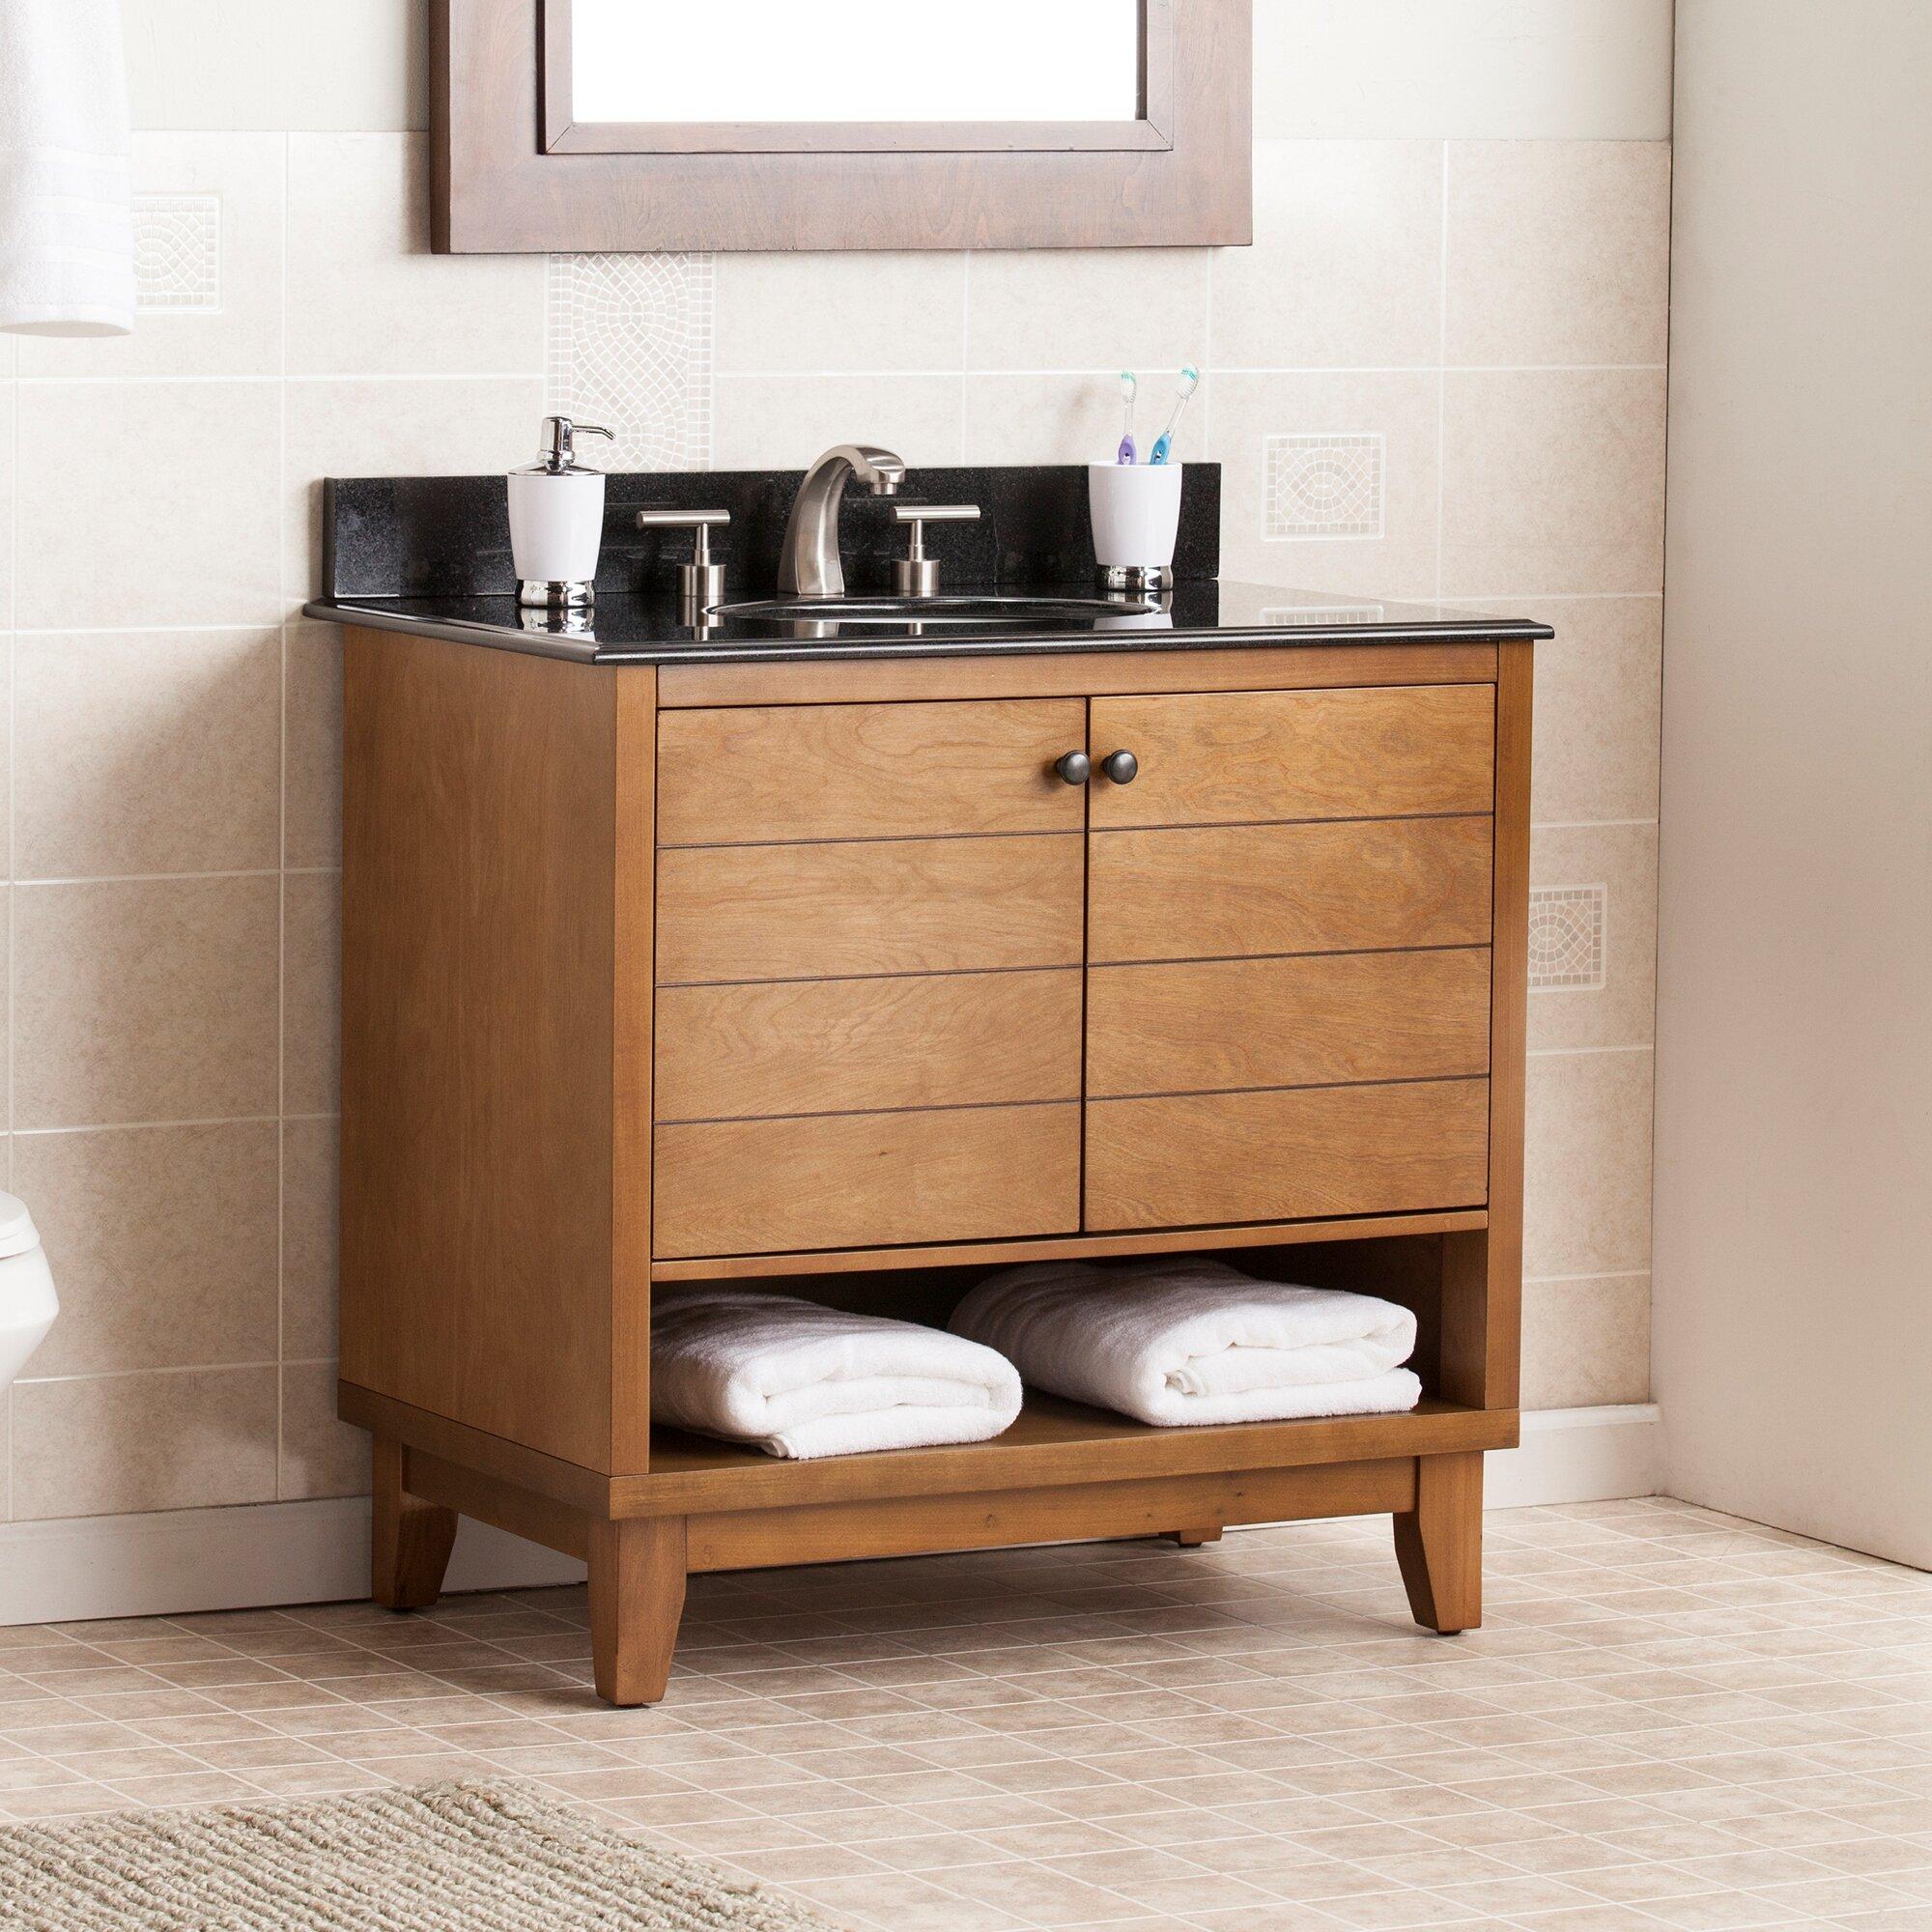 "Wildon Home ® Reading 34"" Single Bath Vanity Sink with ..."